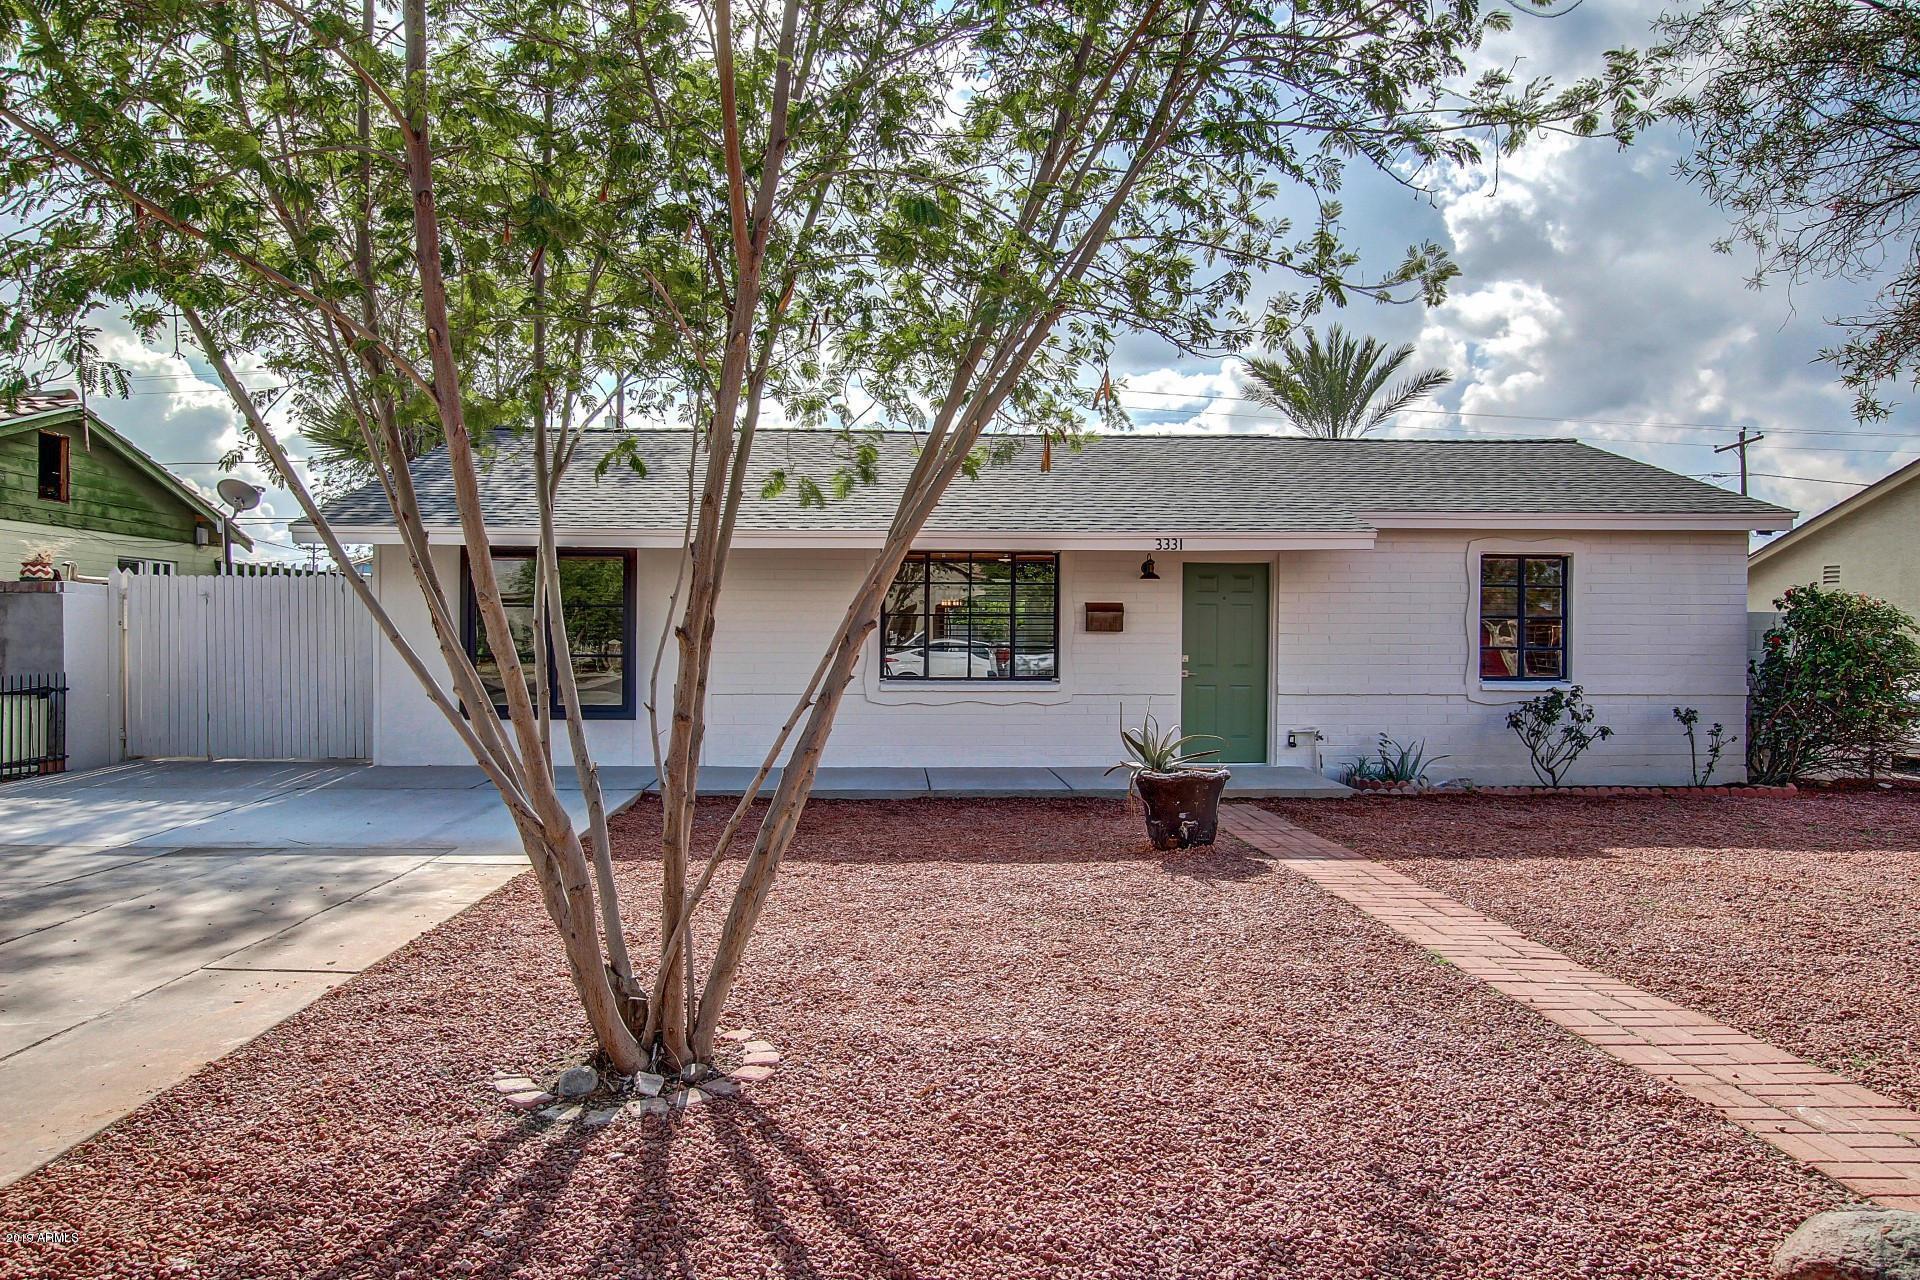 Photo for 3331 E Harvard Street, Phoenix, AZ 85008 (MLS # 5951517)